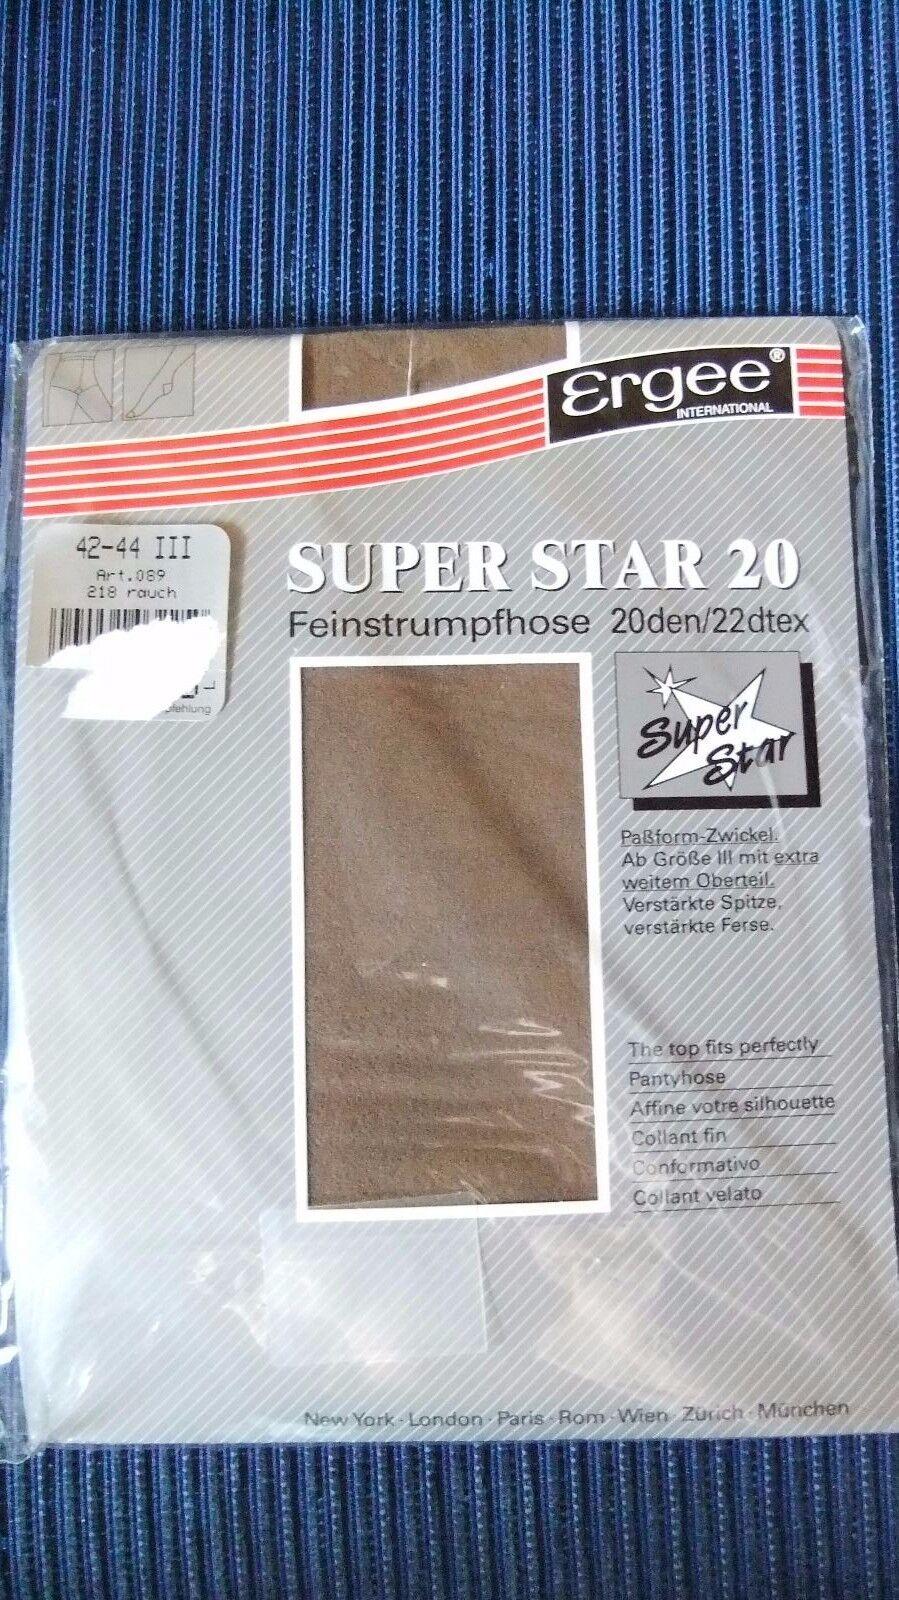 Feinstrumpfhose, super Star 20, 42-44 III, 218 Rauch